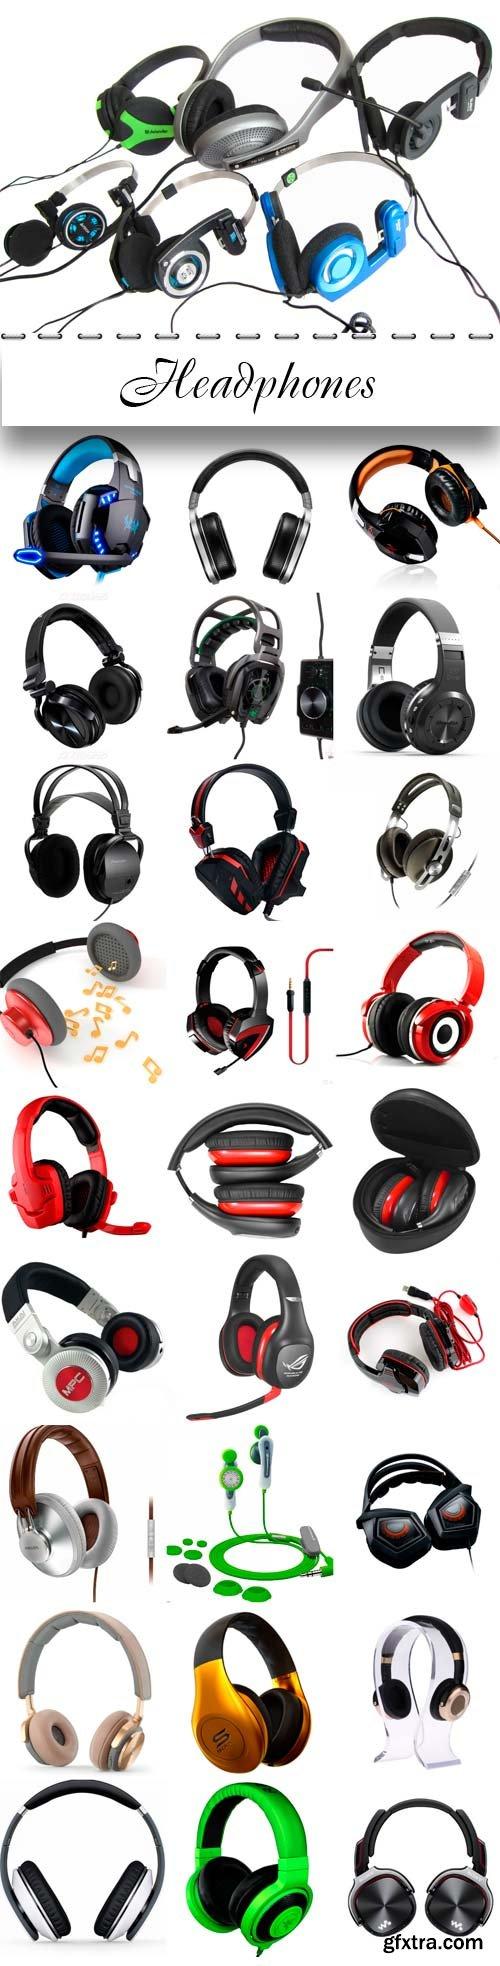 Headphones raster graphics